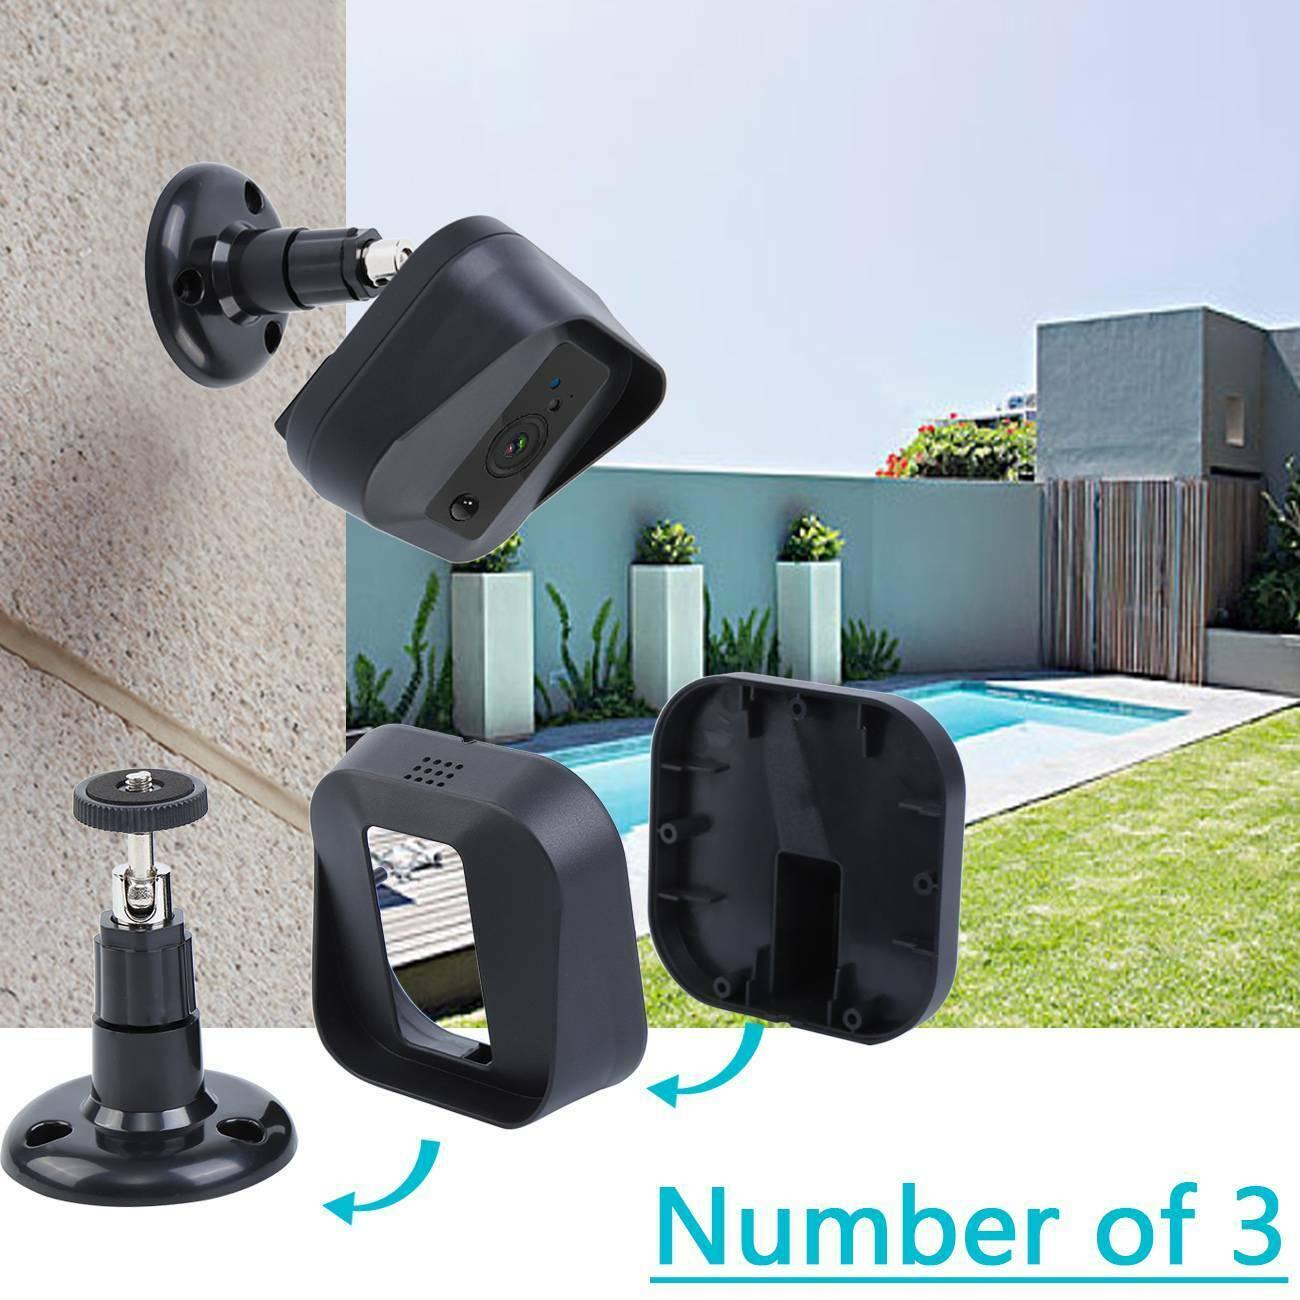 Honhill Wall Mount Camera Bracket Holder Waterproof For Blink XT XT2 Security Camera Cam Adjustable 360 Degree Camera Holder